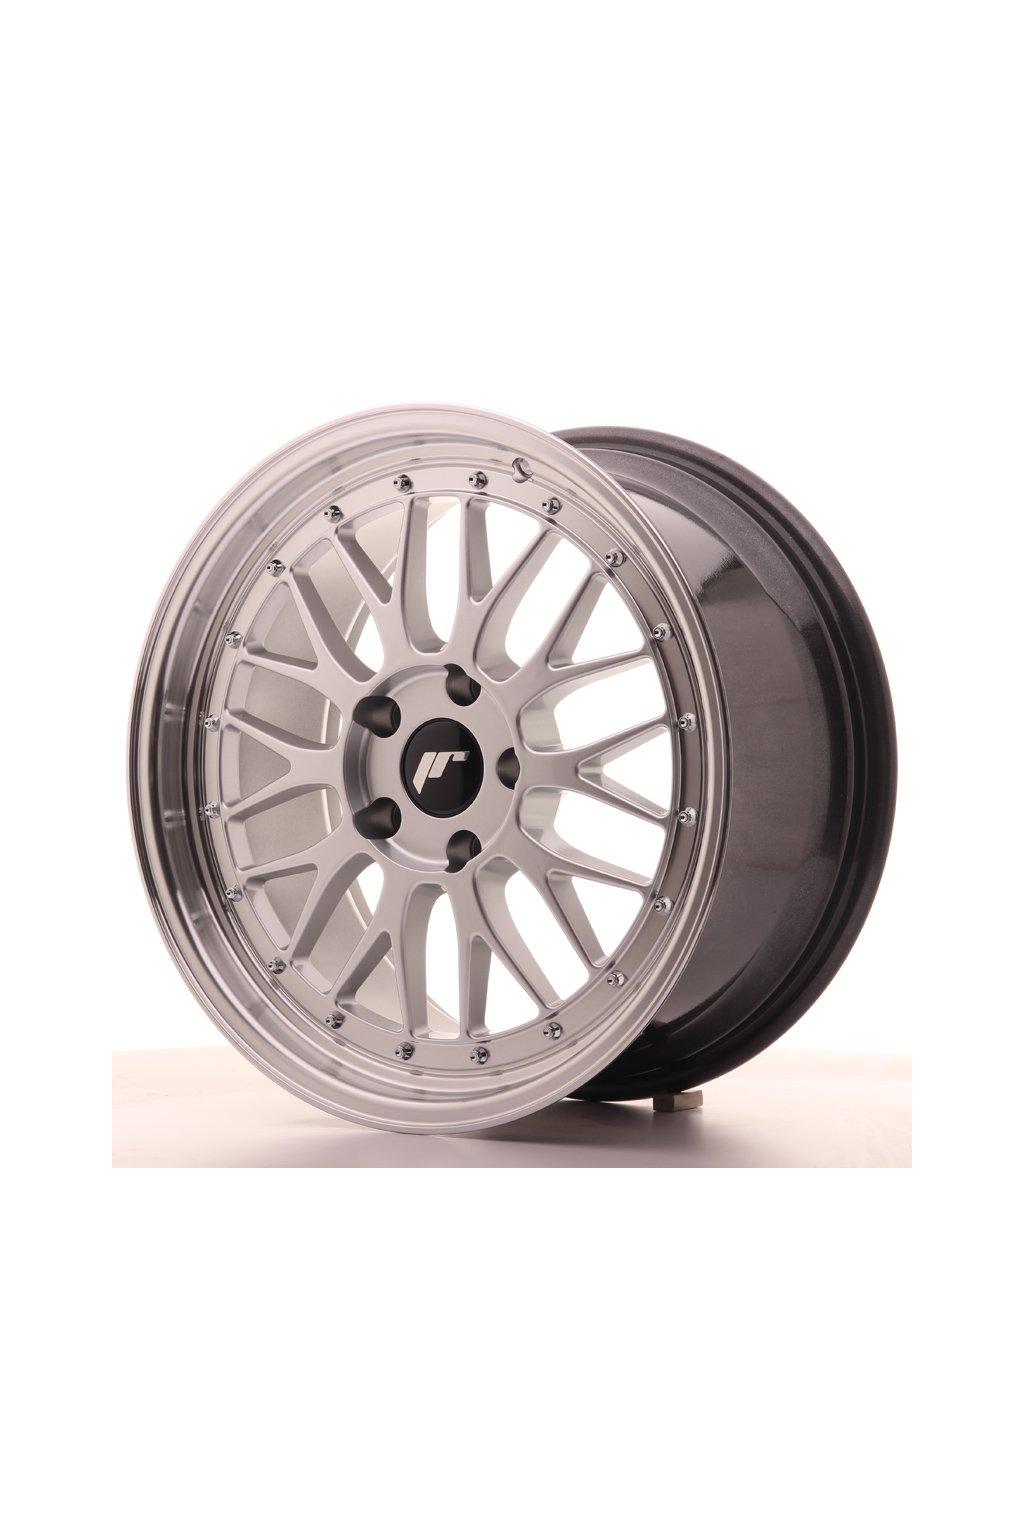 Disk Japan Racing JR23 18x8,5 ET25 5x120 Hyper Silver